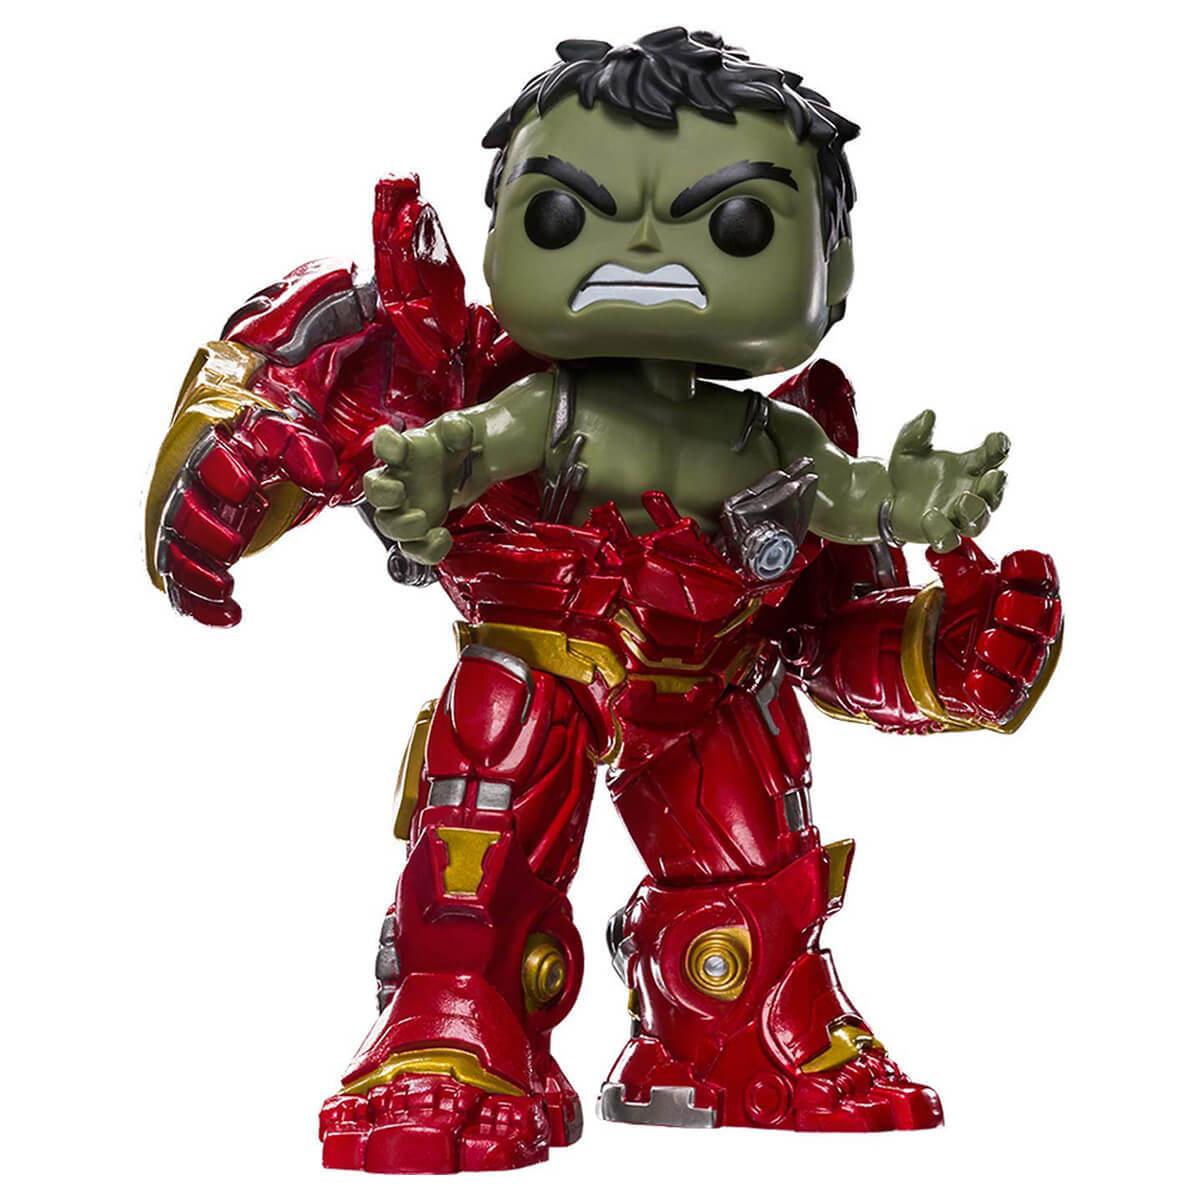 2018, Toy NUEVO Iron Man Marvel Funko Pop Avengers Infinity War